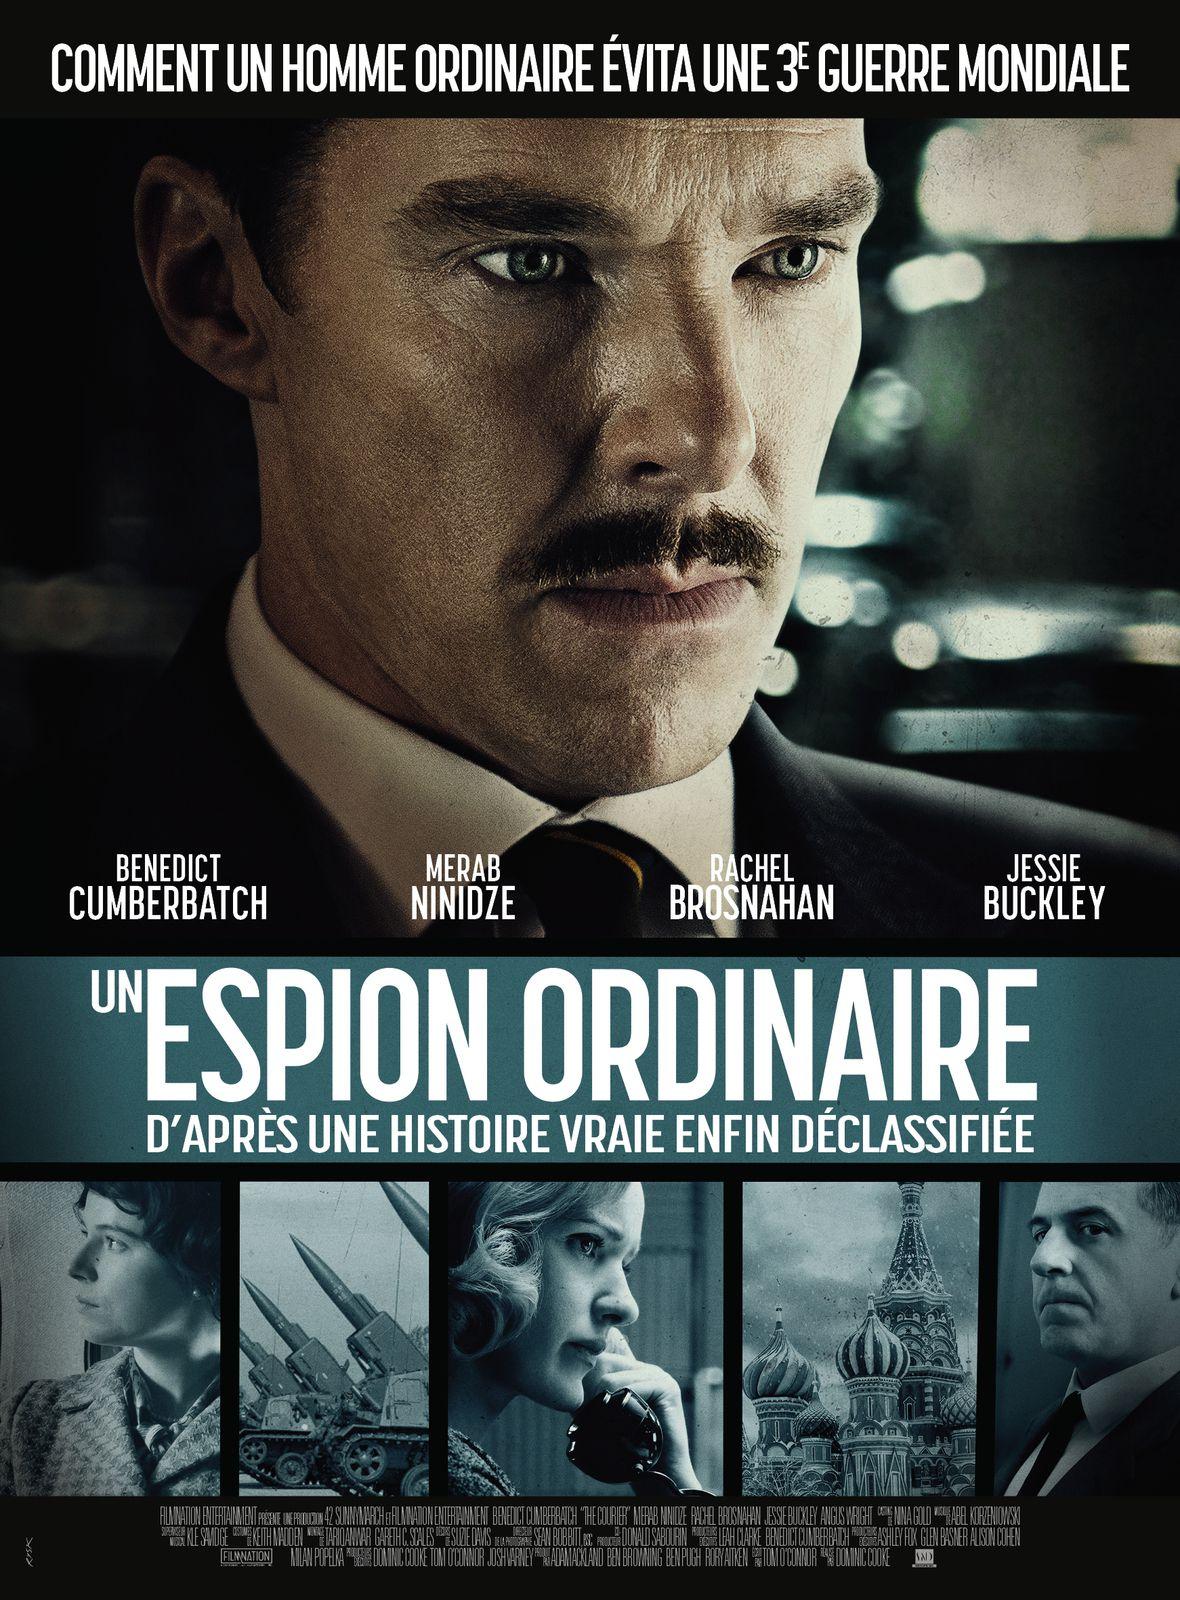 Un espion ordinaire (BANDE-ANNONCE) avec Benedict Cumberbatch, Merab Ninidze - Le 23 juin 2021 au cinéma